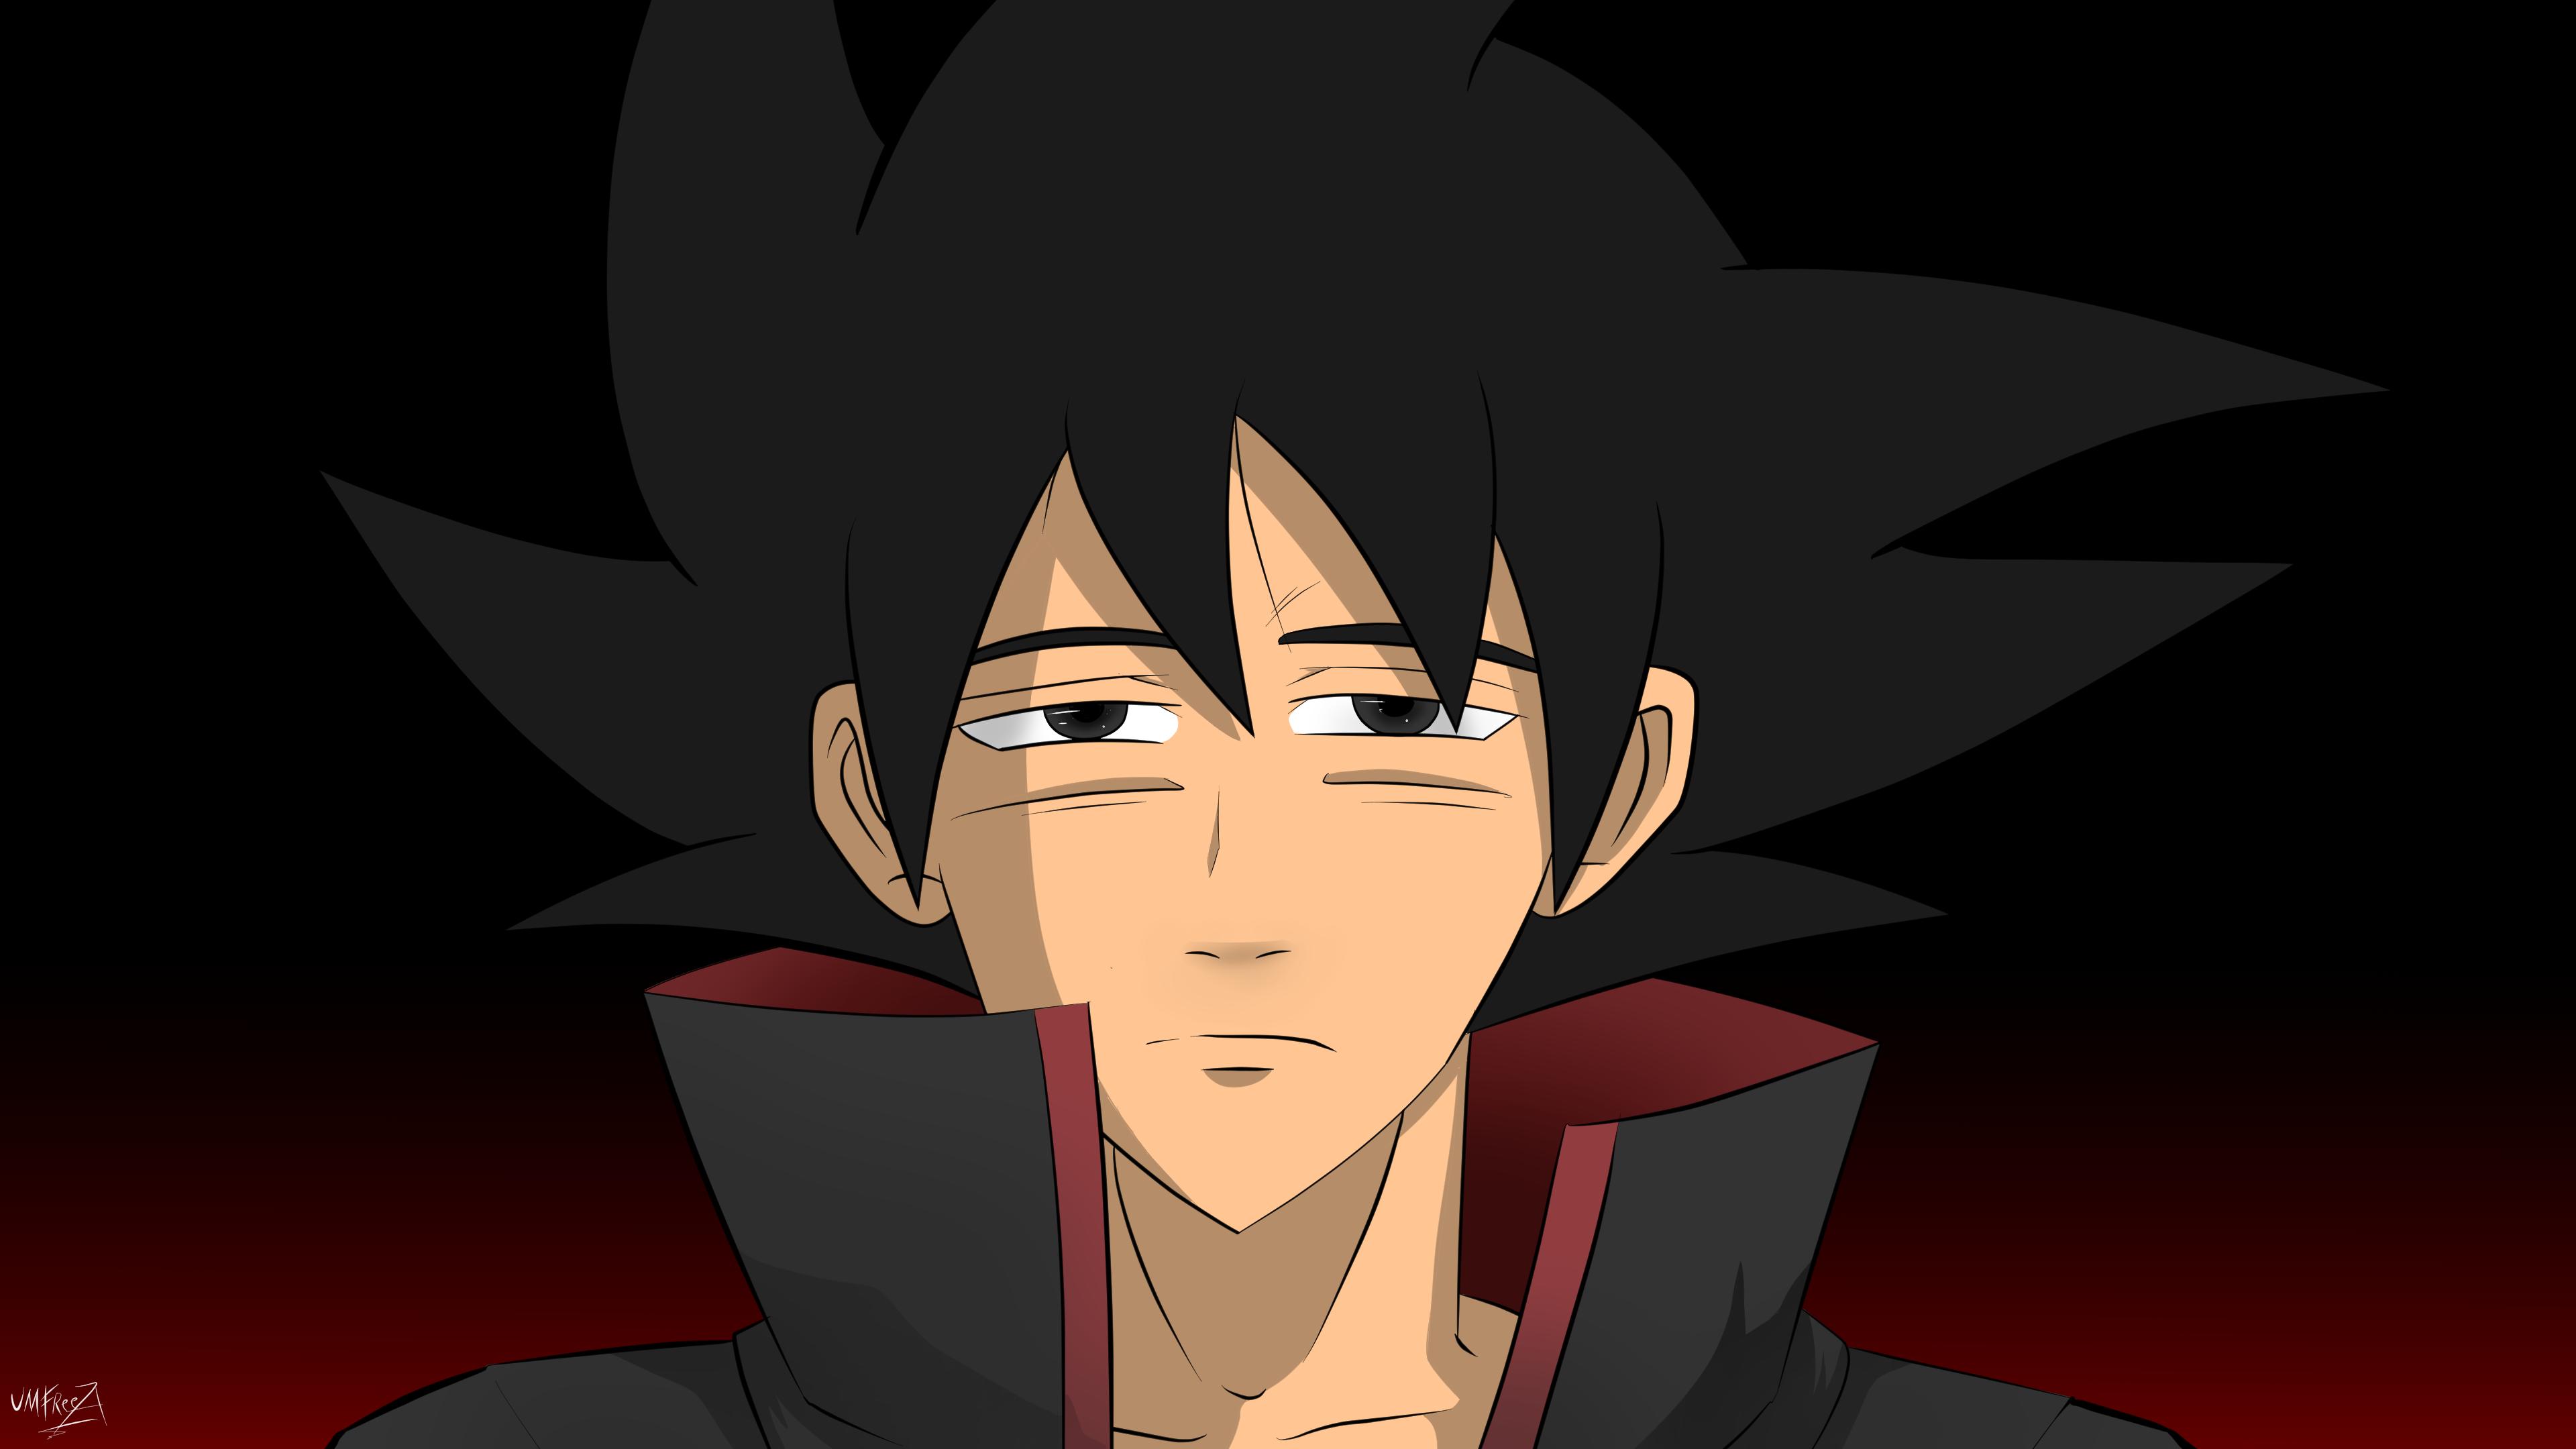 Naruto Dragon Ball 3840x2160